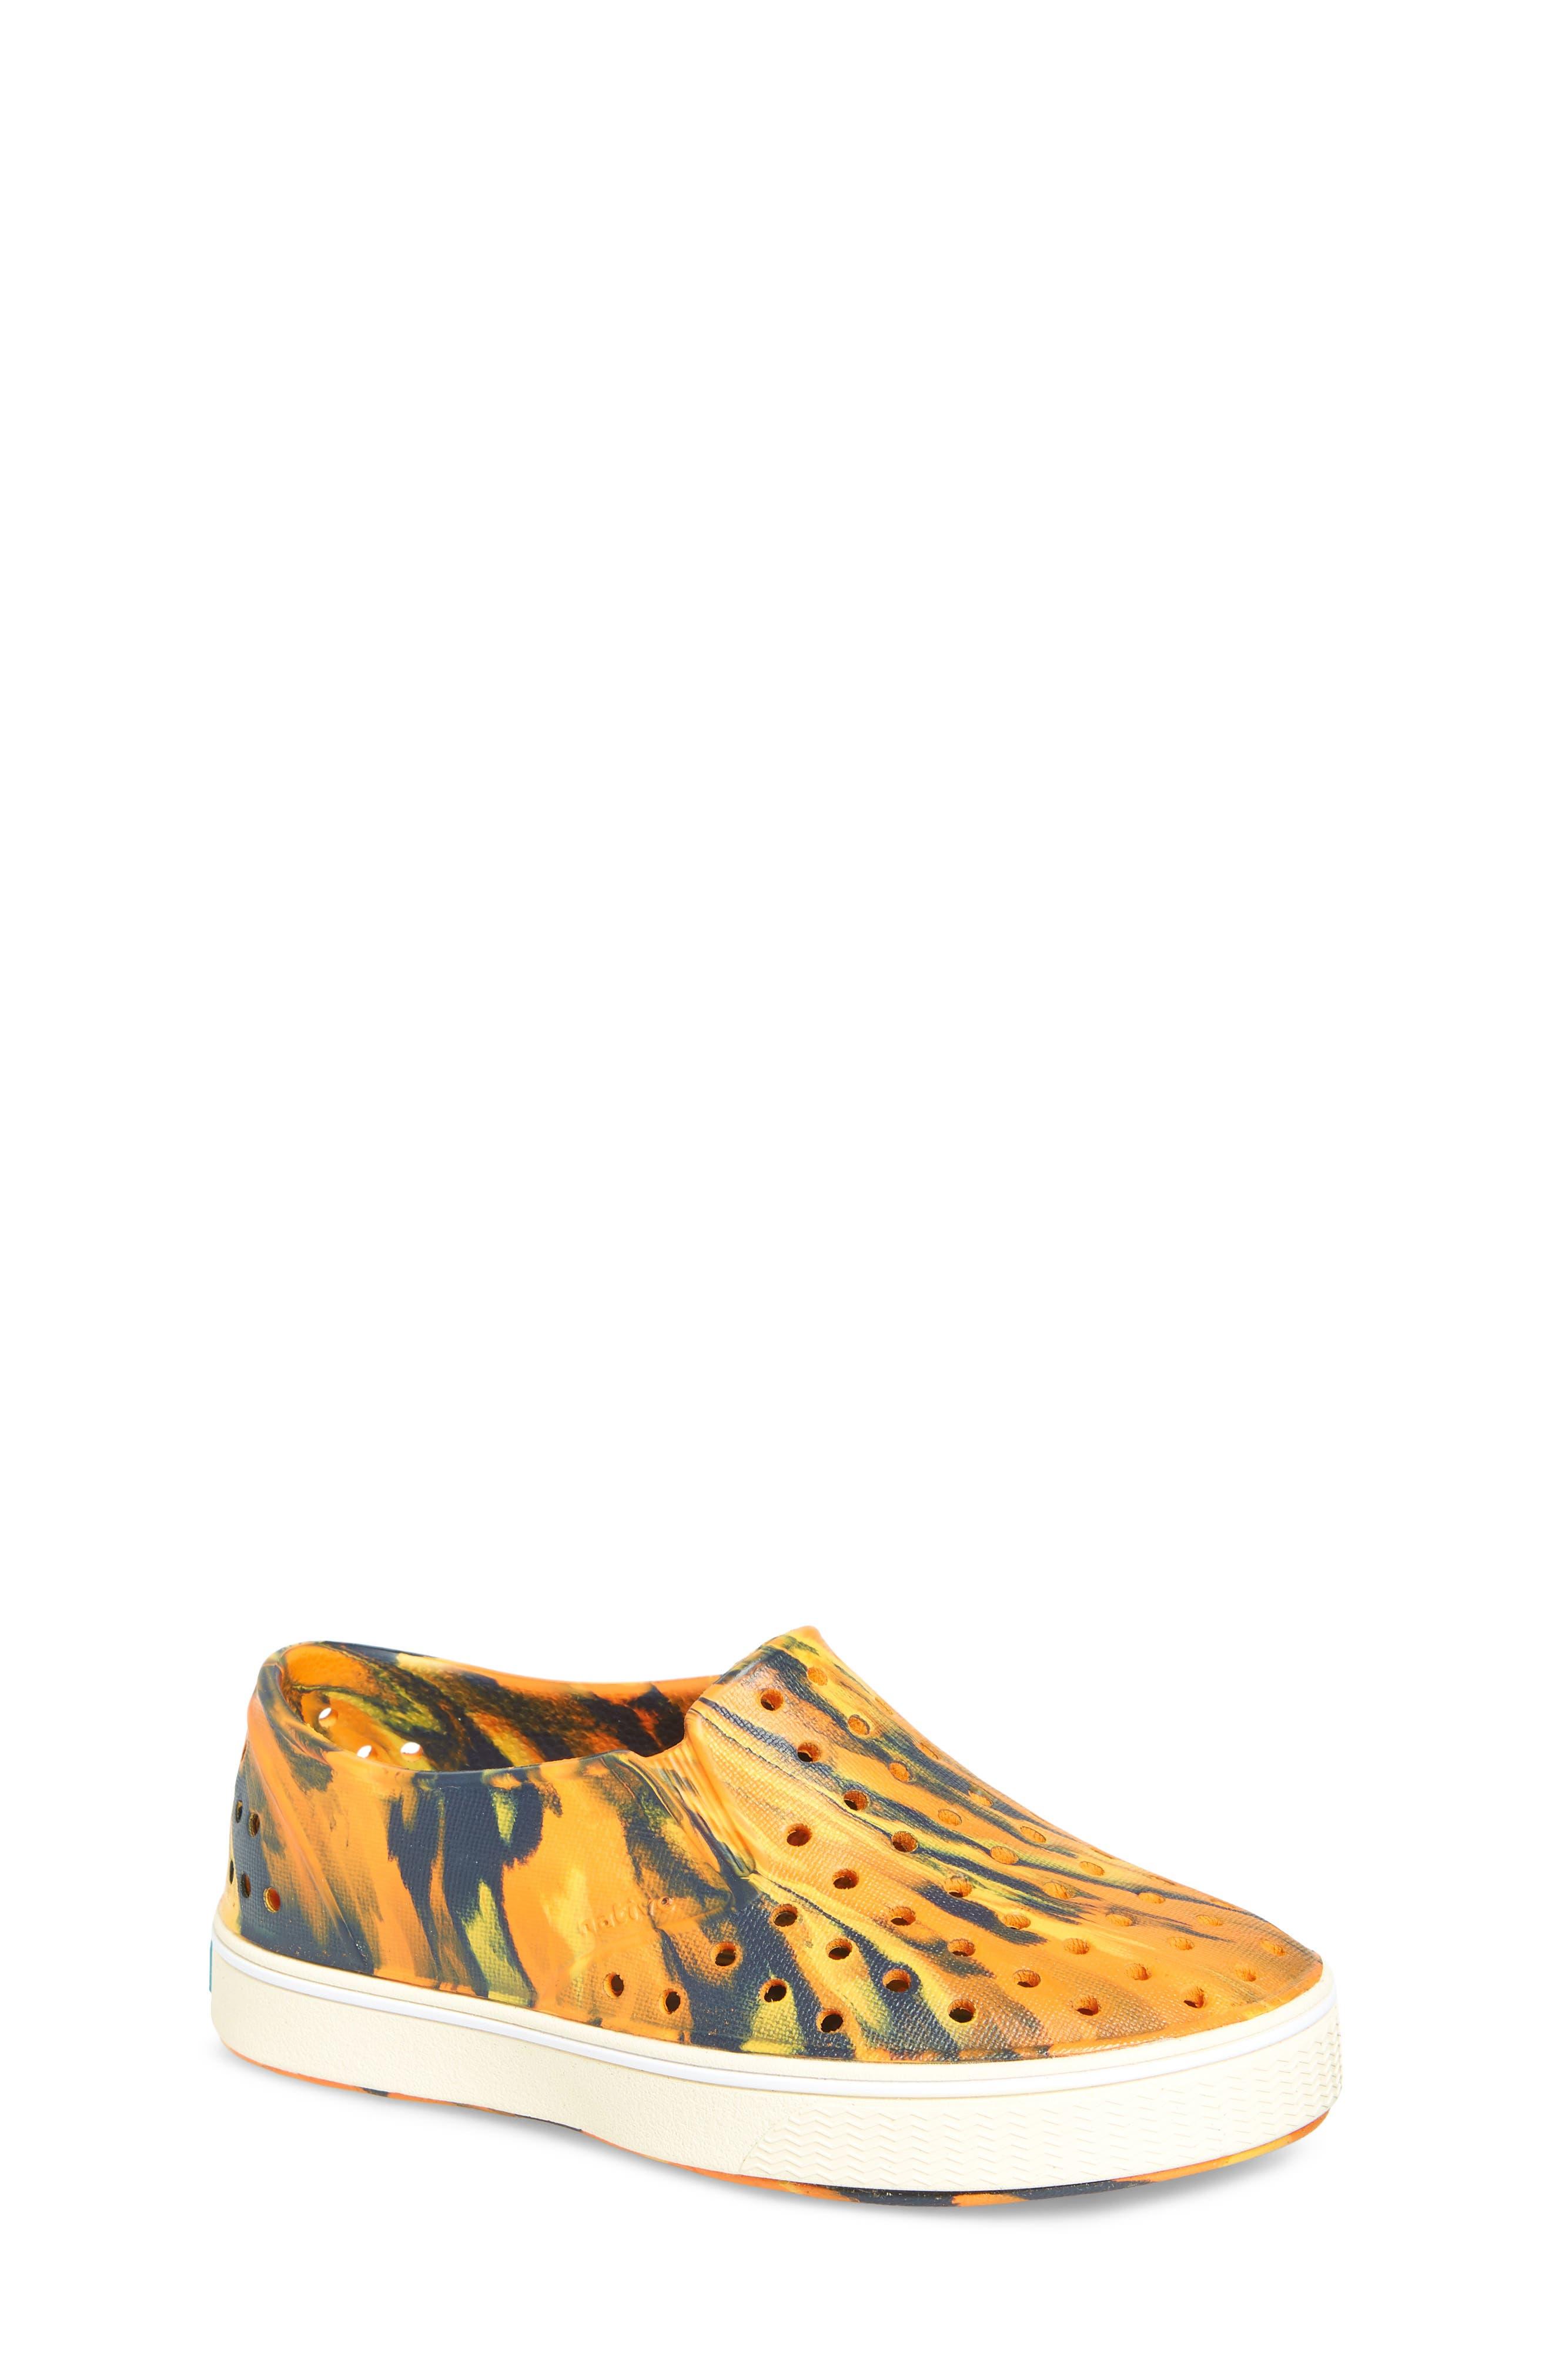 Native Shoes Miles Marbled Slip-On Sneaker (Baby, Walker, Toddler & Little Kid)